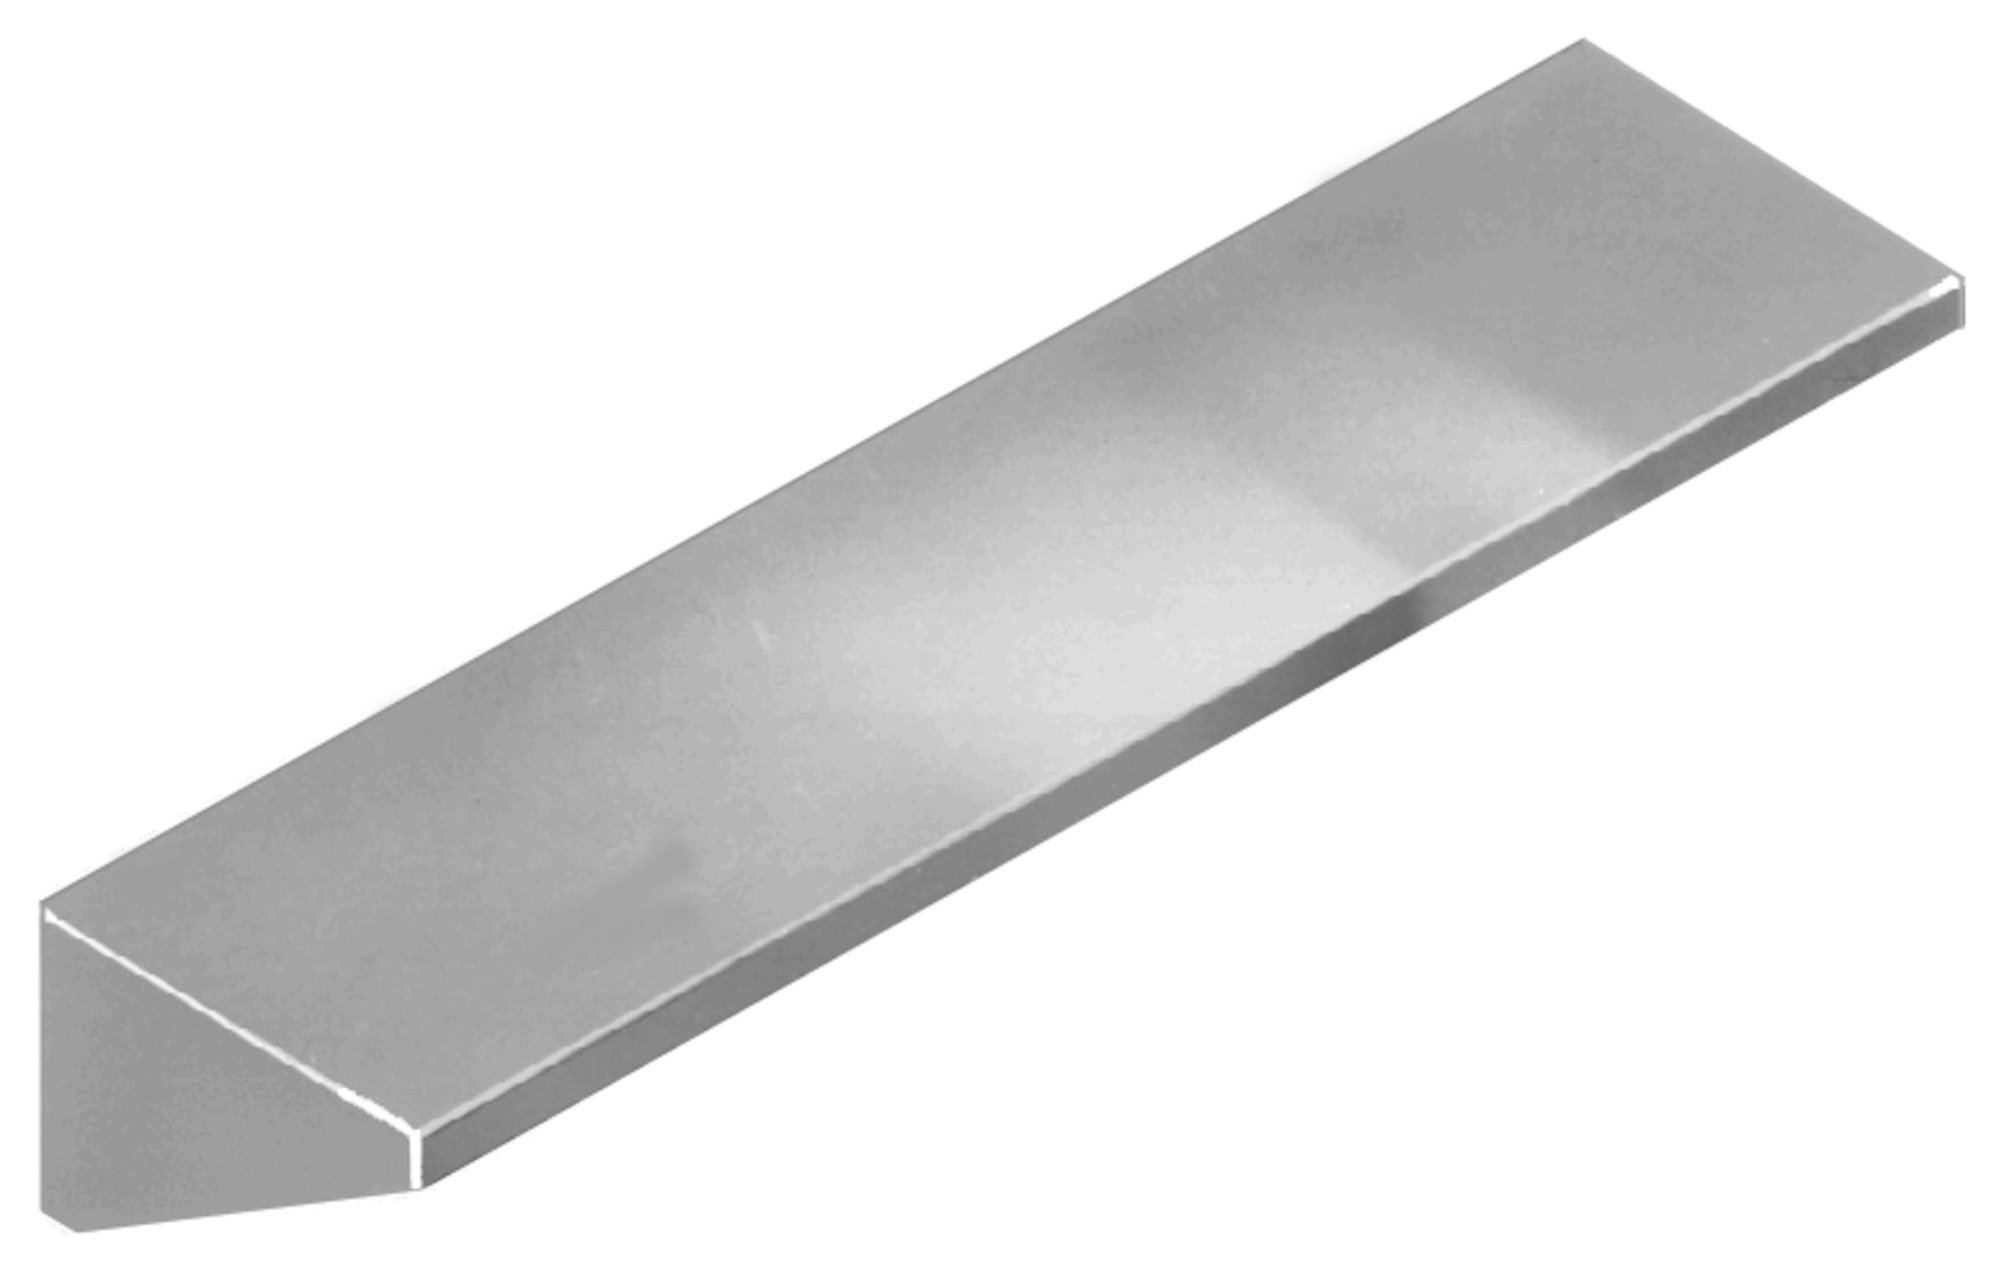 Shelves - Plain SA49-400000 - Accurate Door & Hardware, Inc